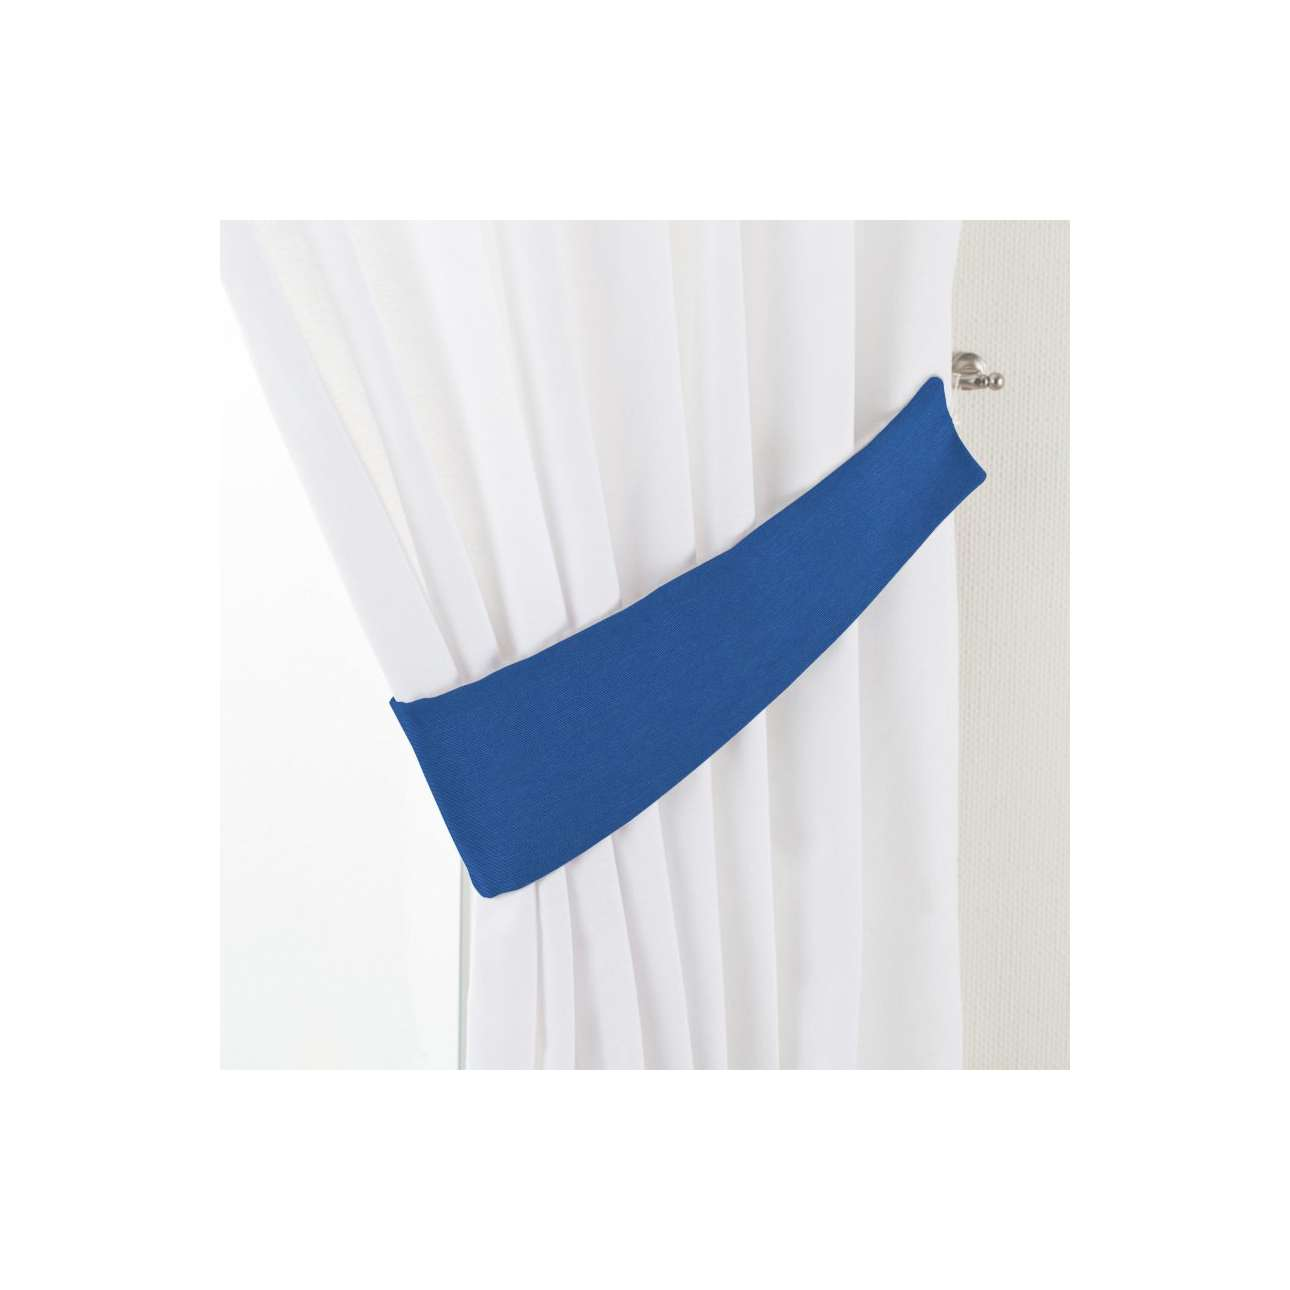 Dekoria Vázačka Victoria, světle modrá, 12 × 70 cm, Jupiter, 127-61